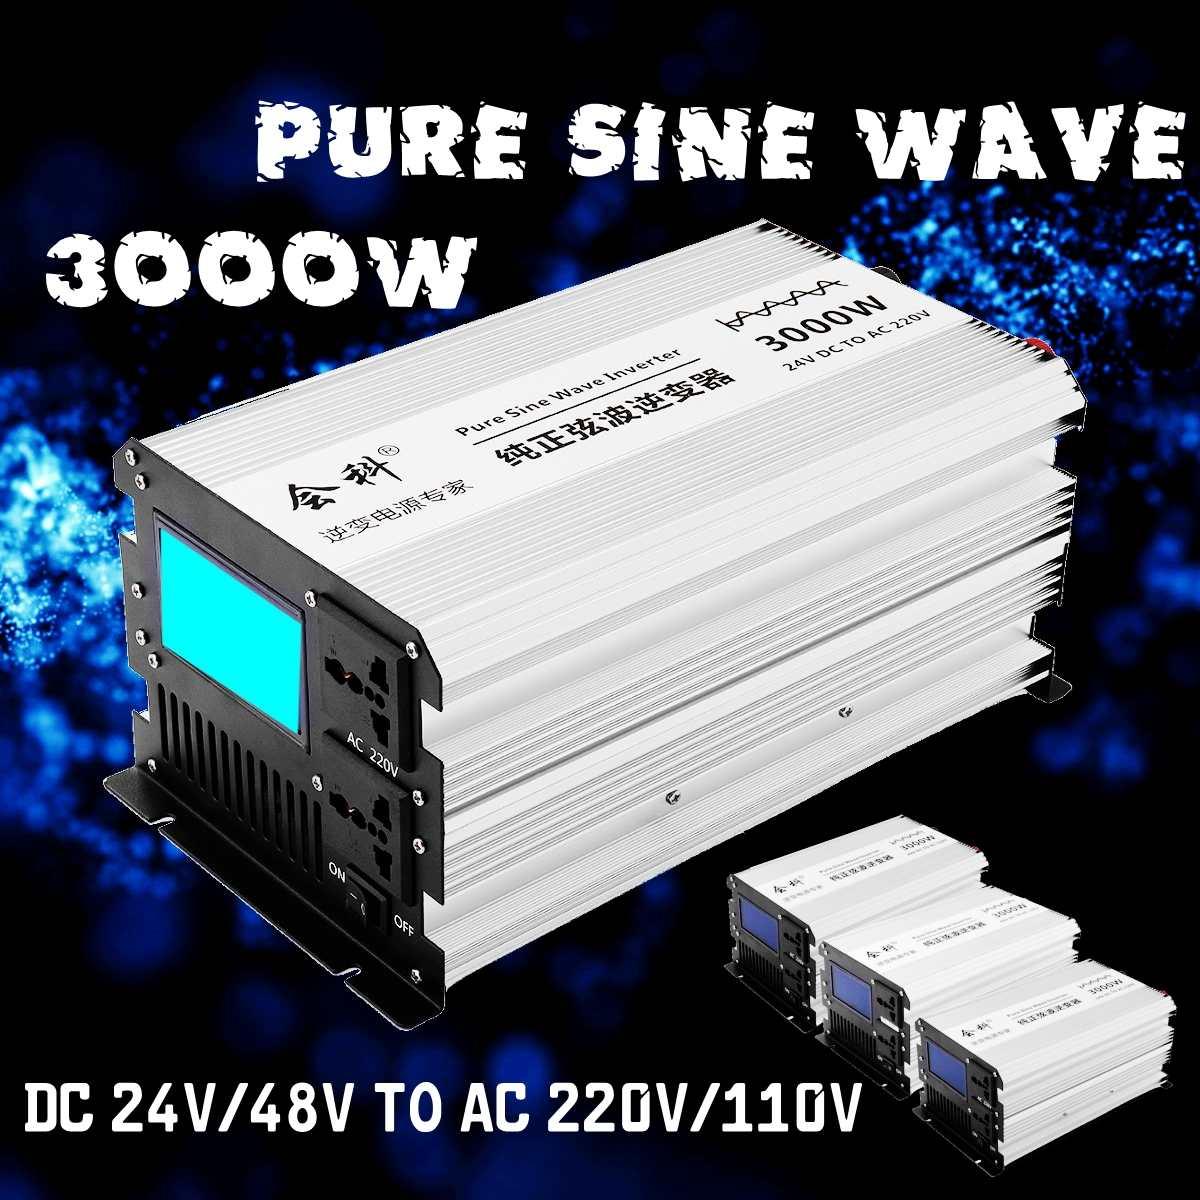 Inverter pure sine wave 1500W 3000W Peaks 12v/24v/48v to AC110v/ 220v LCD display Inverter power supplyInverter pure sine wave 1500W 3000W Peaks 12v/24v/48v to AC110v/ 220v LCD display Inverter power supply